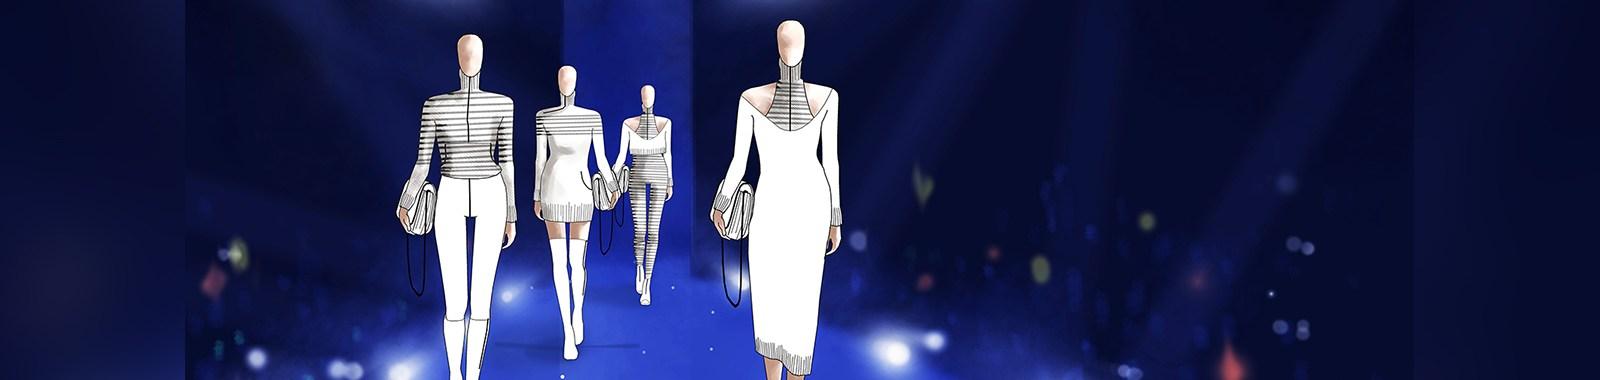 fashion sketch design on digital paint runway stage background